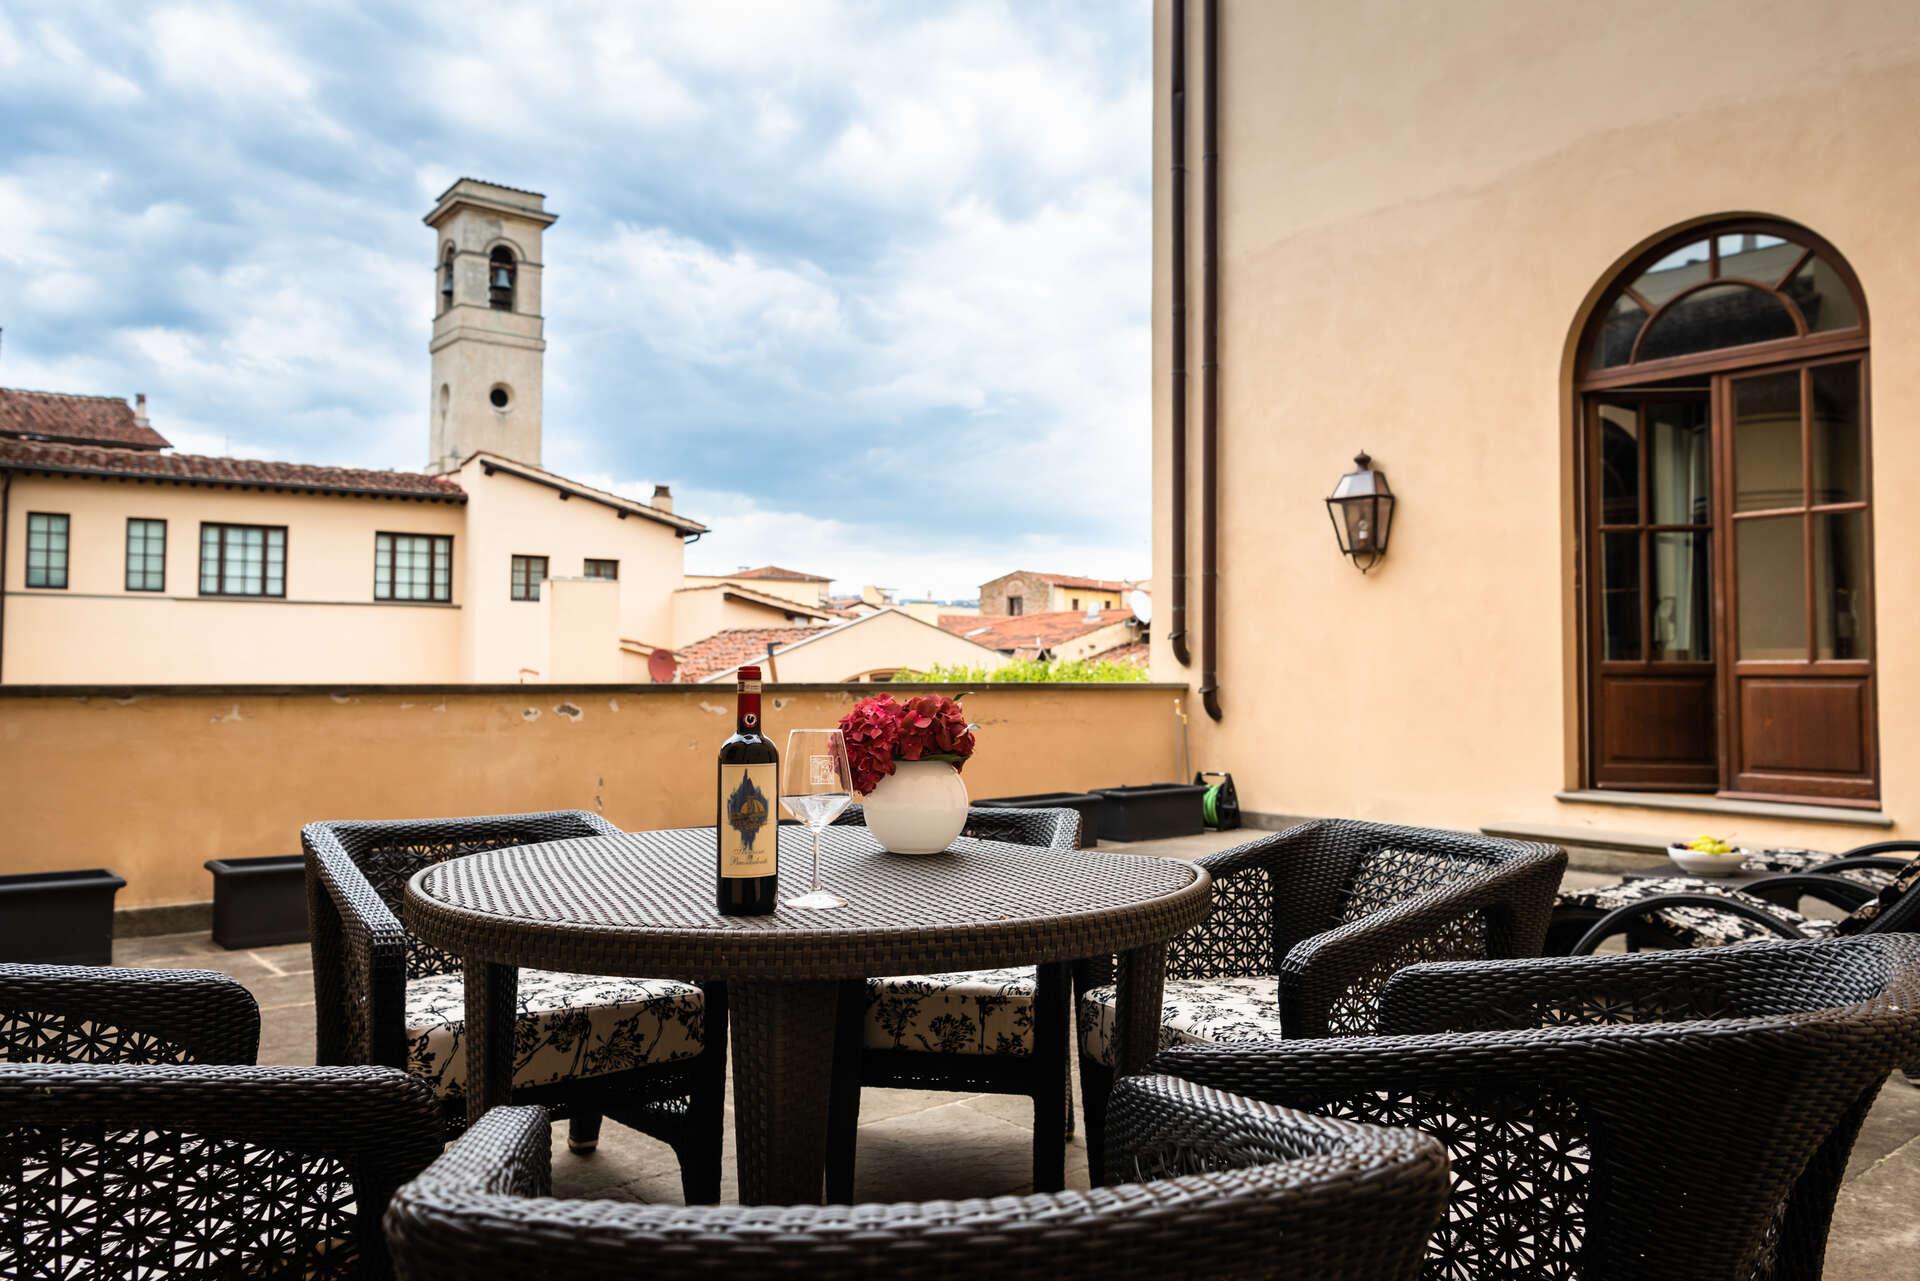 Luxury vacation rentals europe - Italy - Tuscany - Florence - Terraza Buontalenti Apartment - Image 1/47